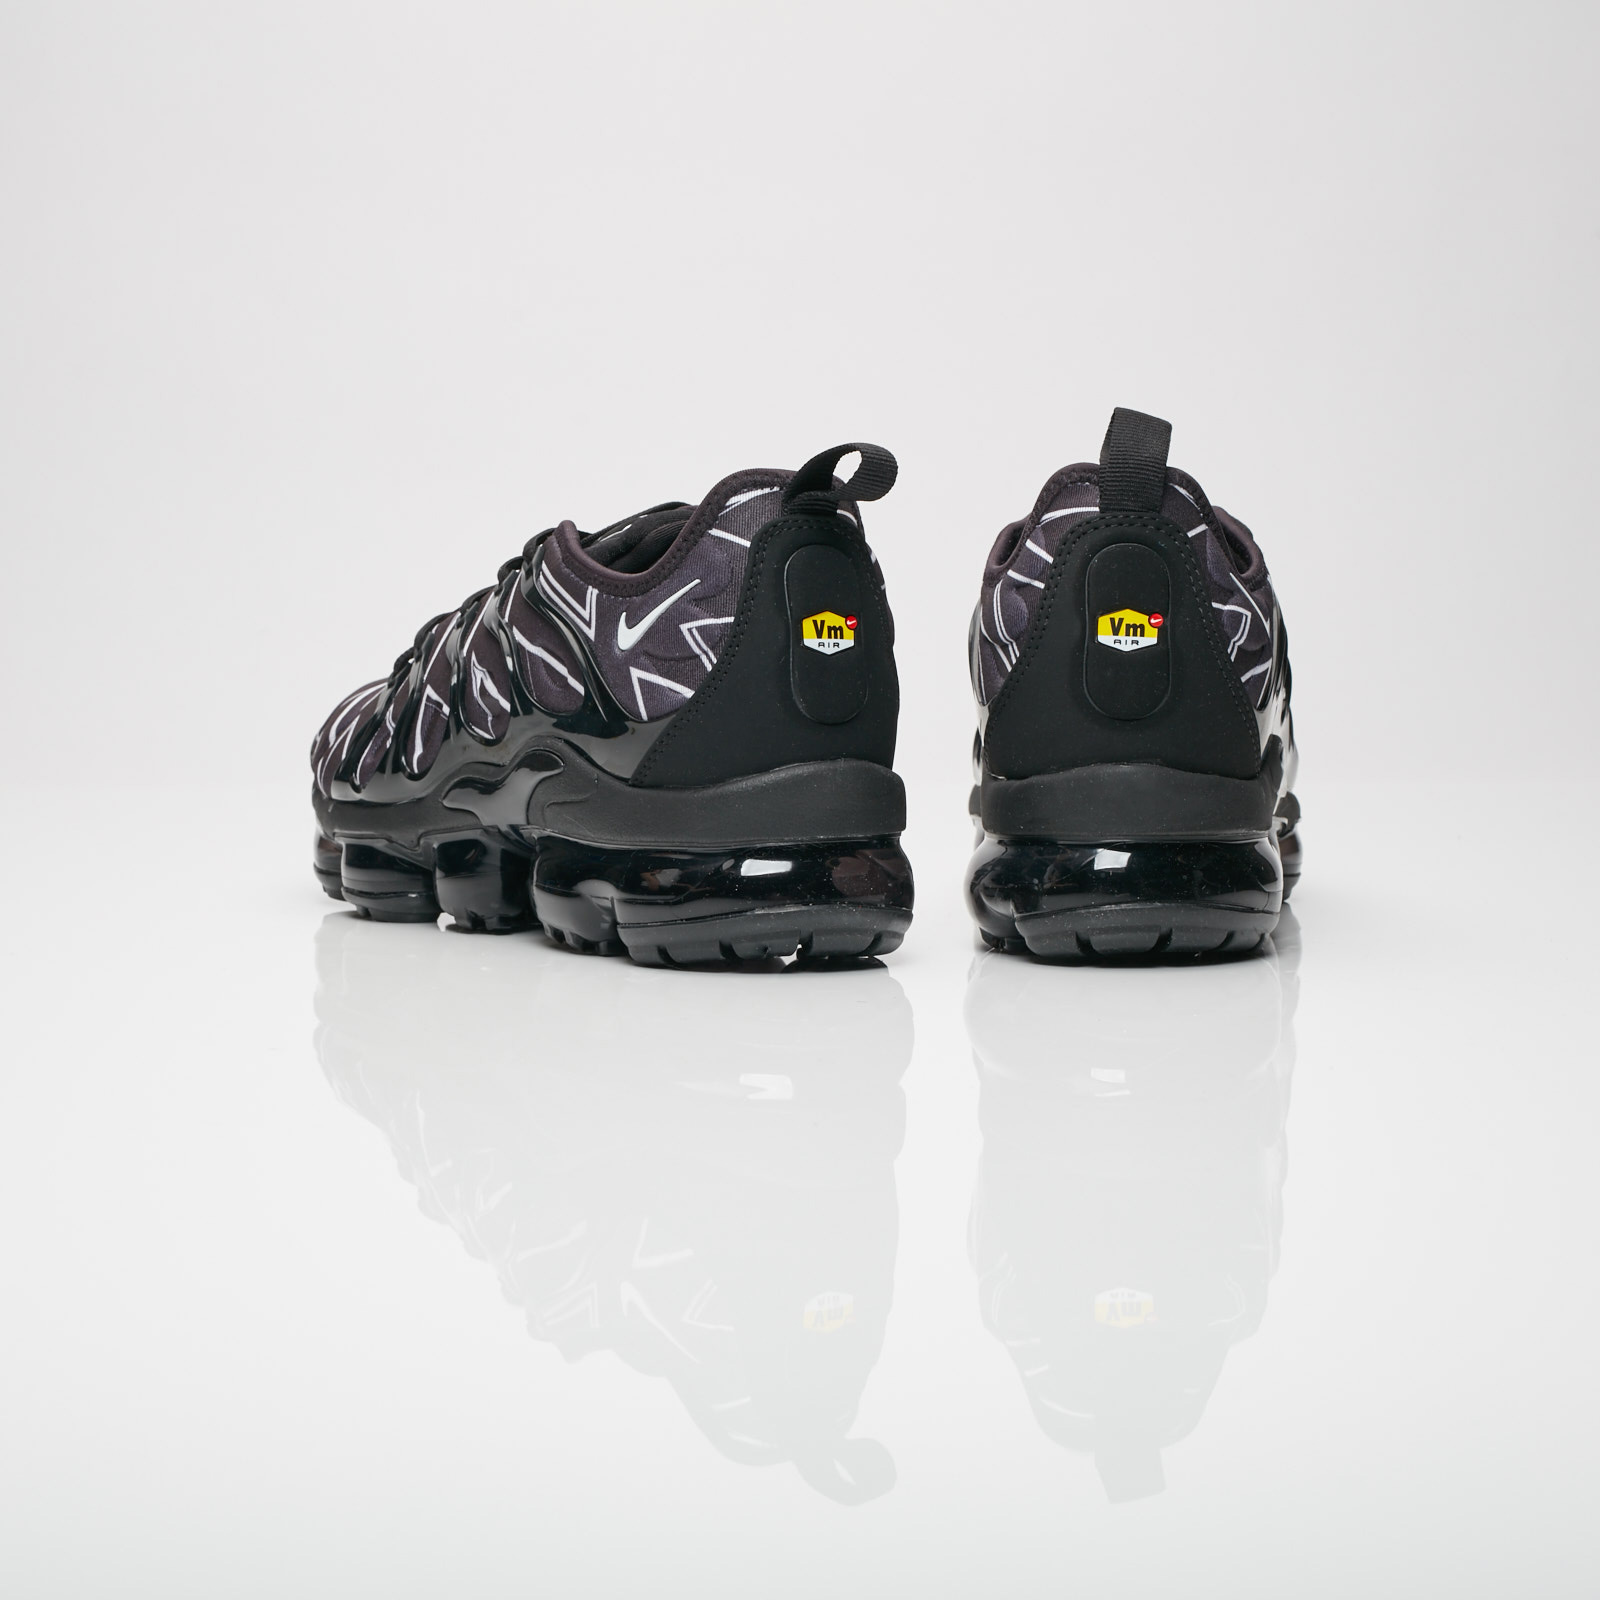 Nike Air Vapormax Plus HL - Aj6312-001